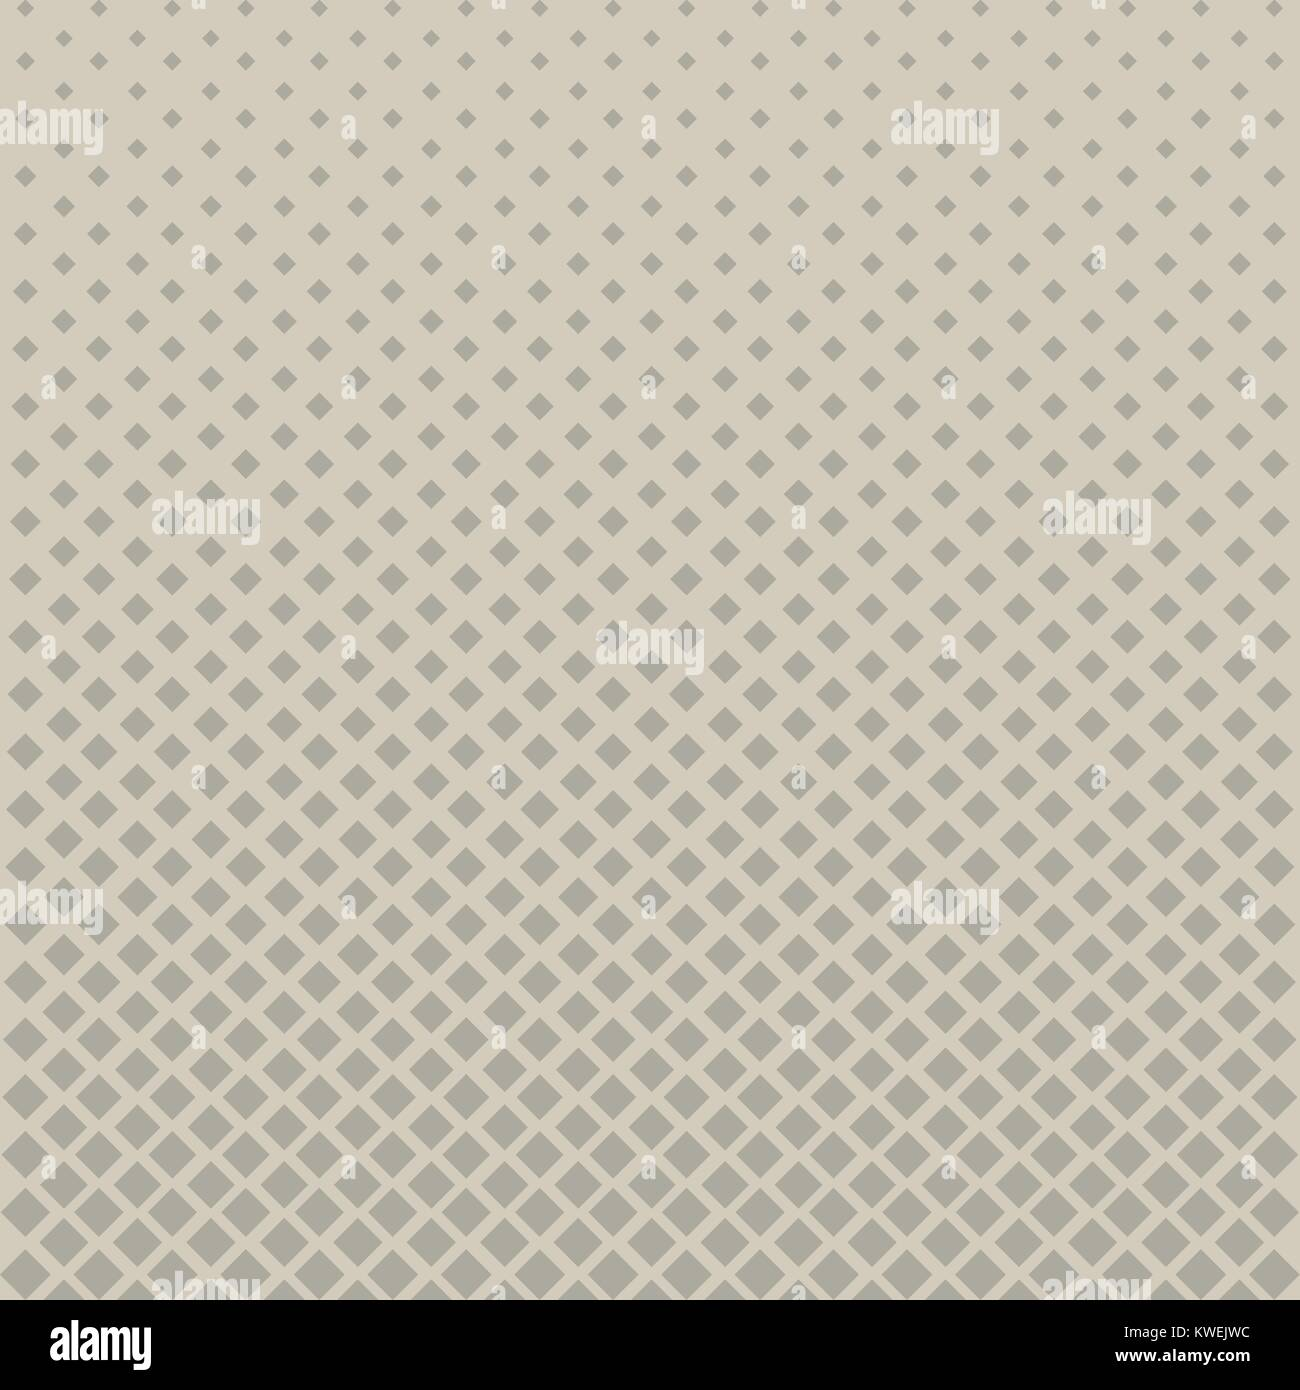 Abstrakte Halftone Graues Quadrat Muster Auf Braunem